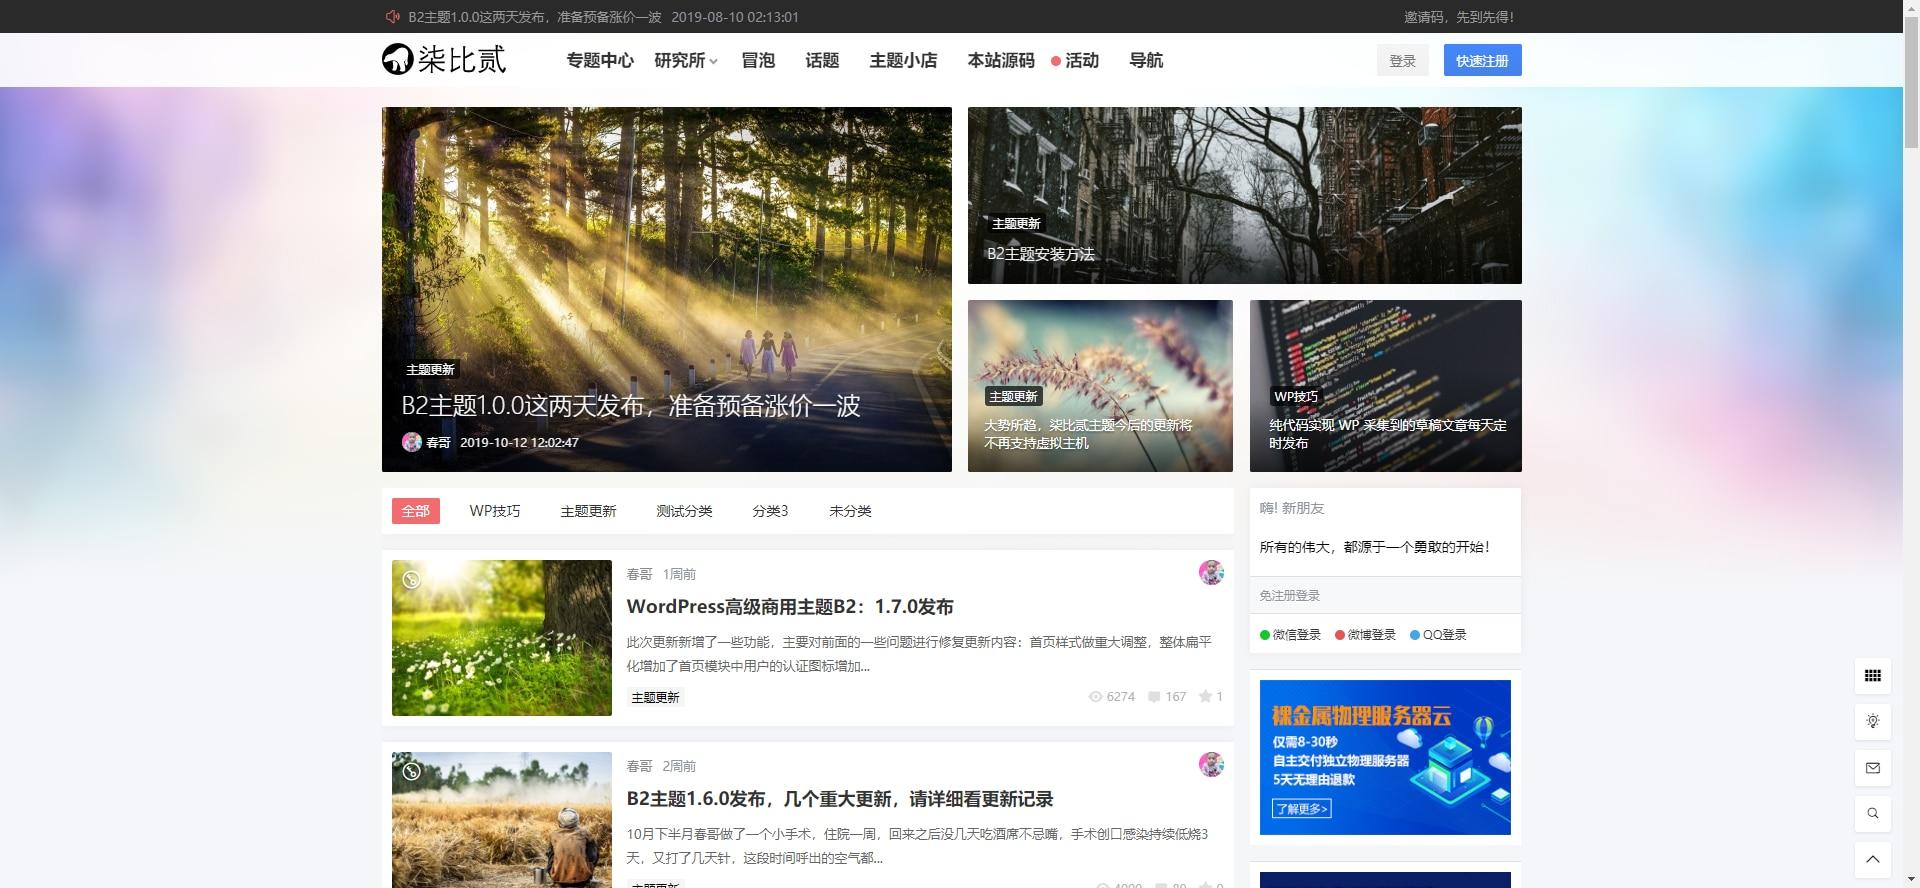 WordPress主题7B2柒比贰v2.8.0破解去授权版-福利博客